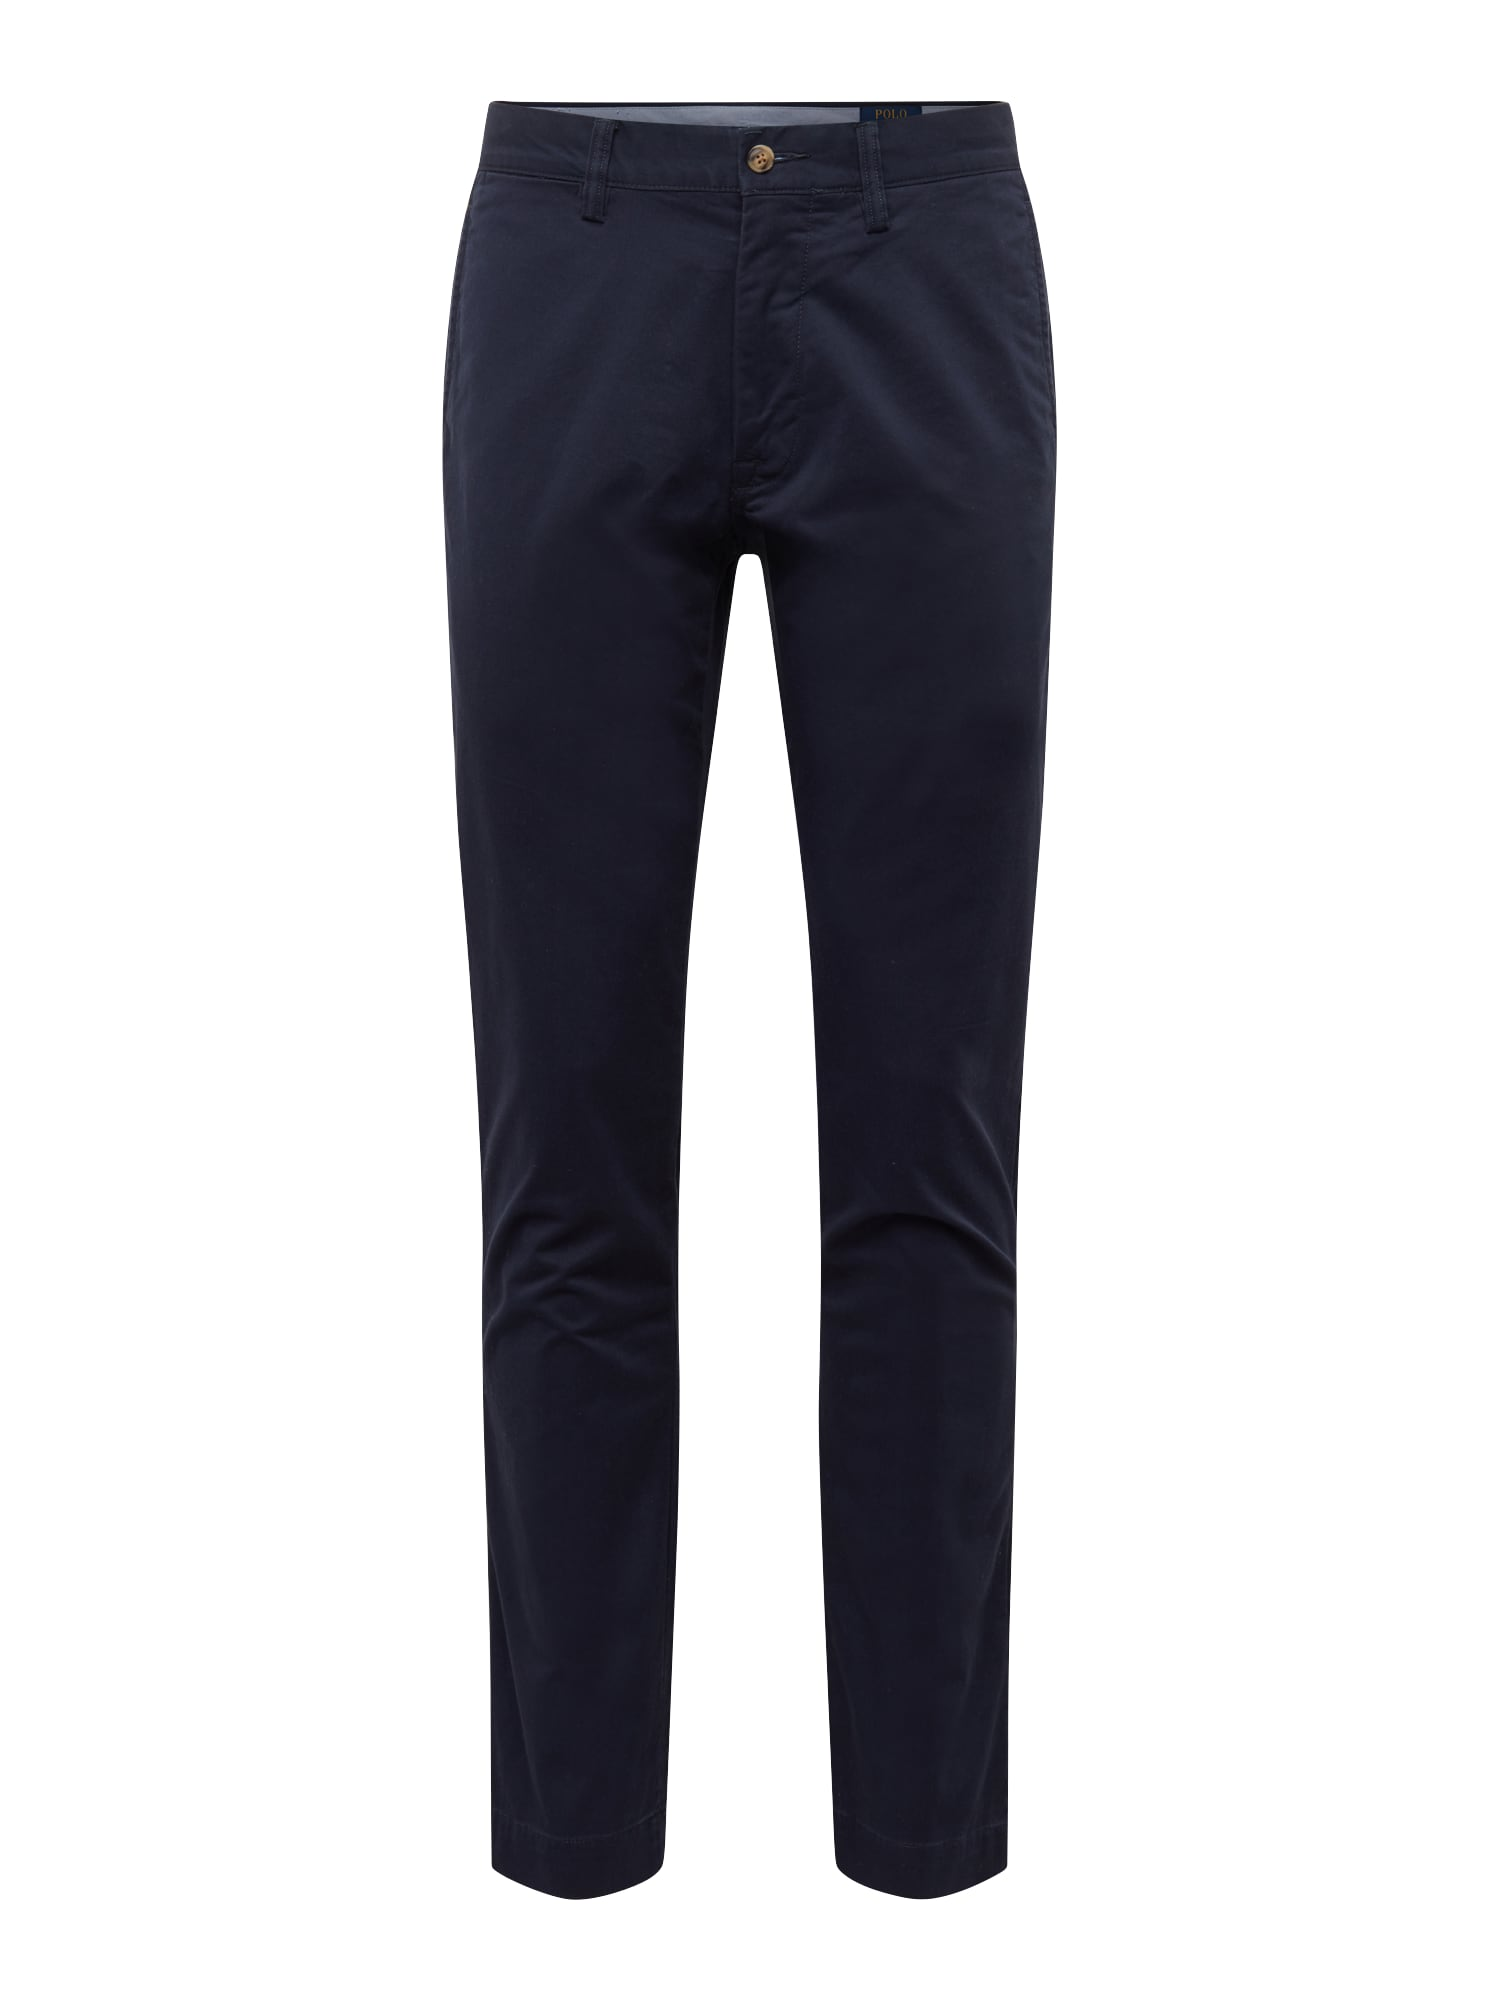 Chino kalhoty marine modrá POLO RALPH LAUREN